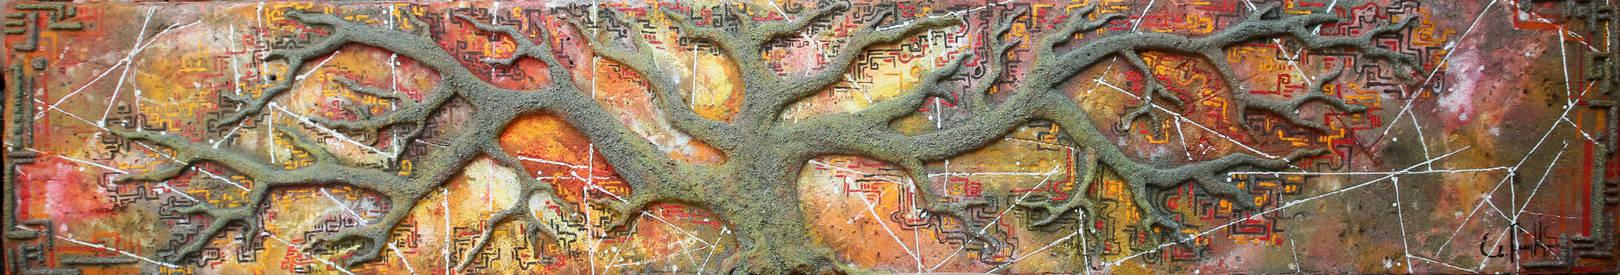 Galaxy Tree